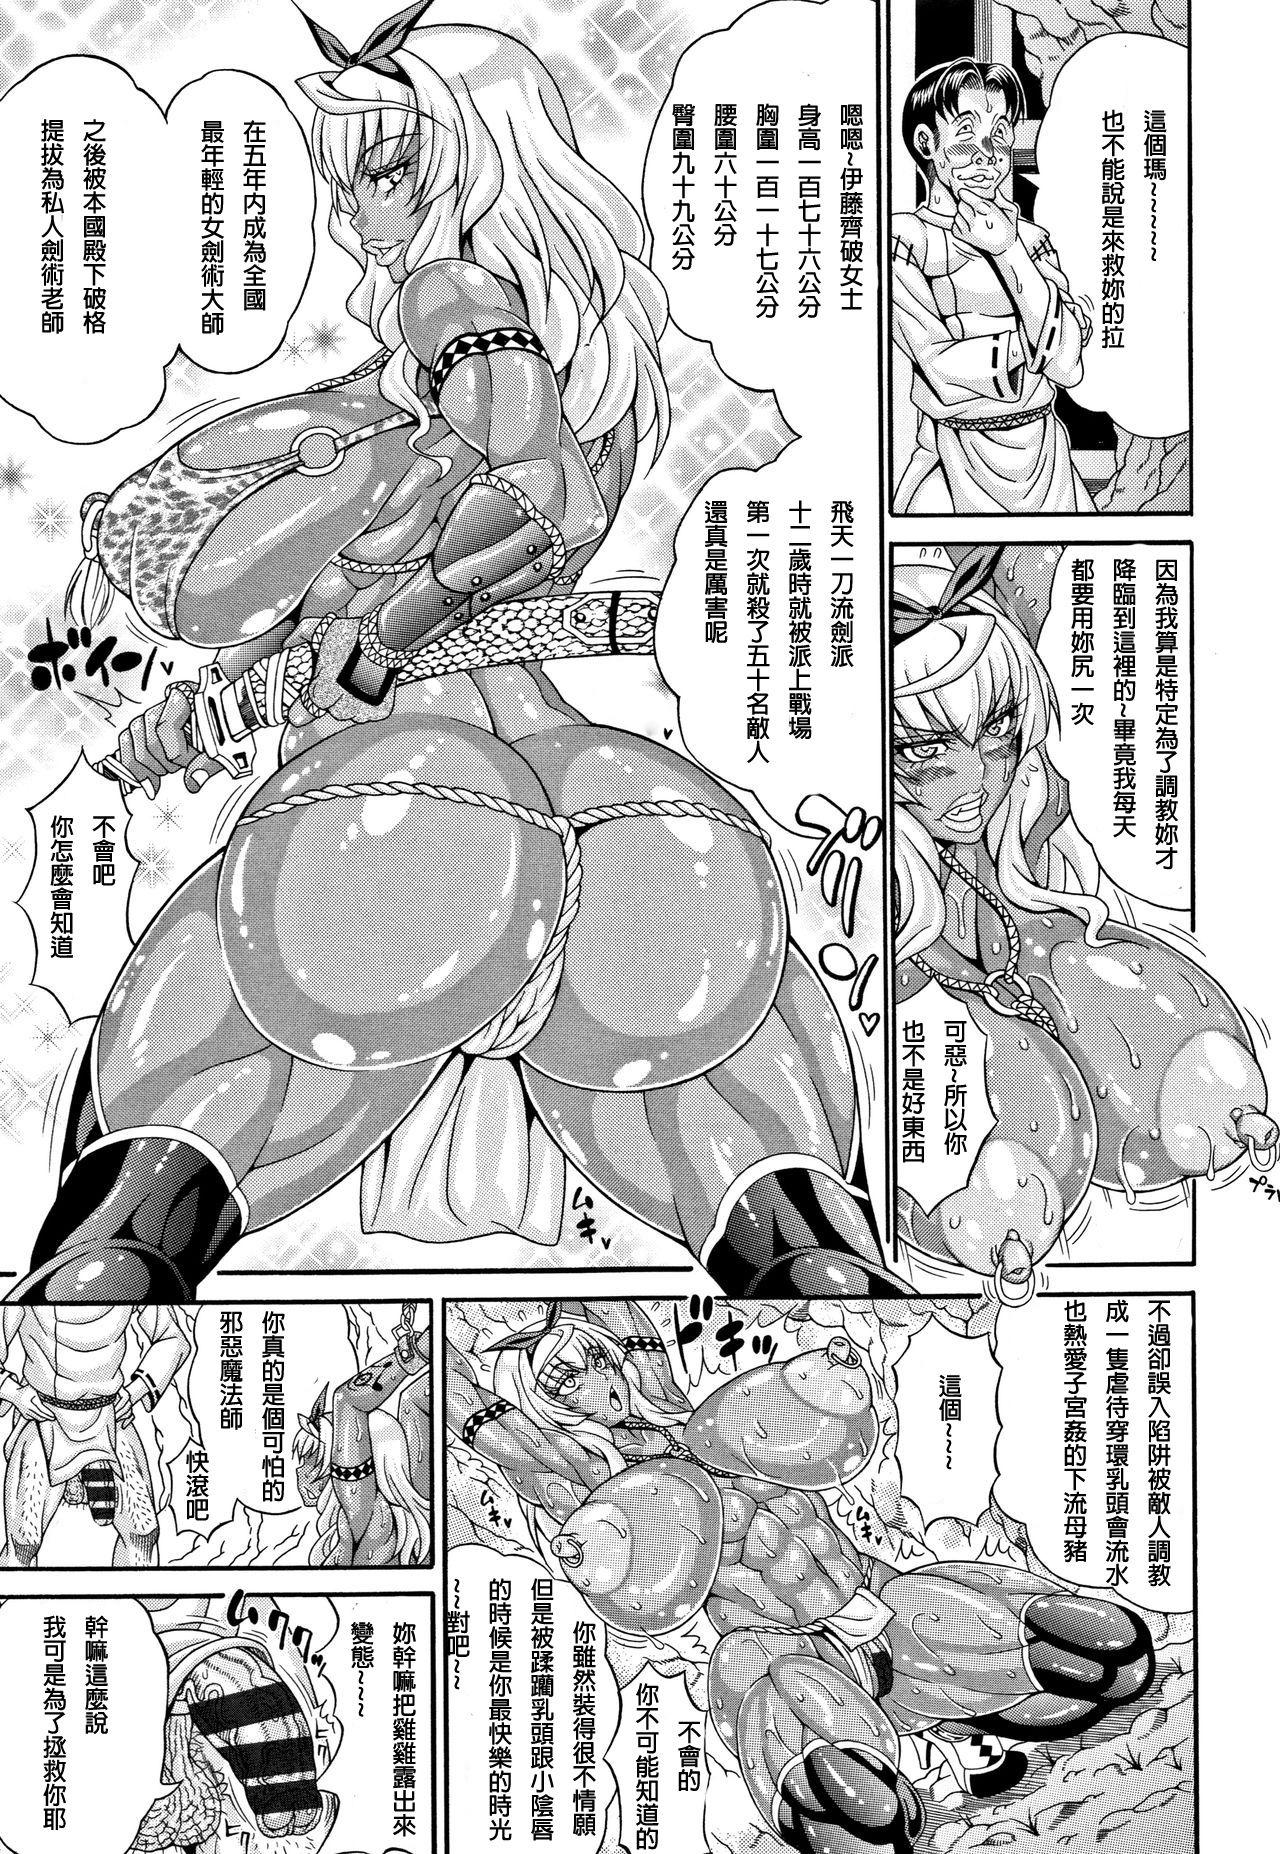 Mahoutsukai Musou 2